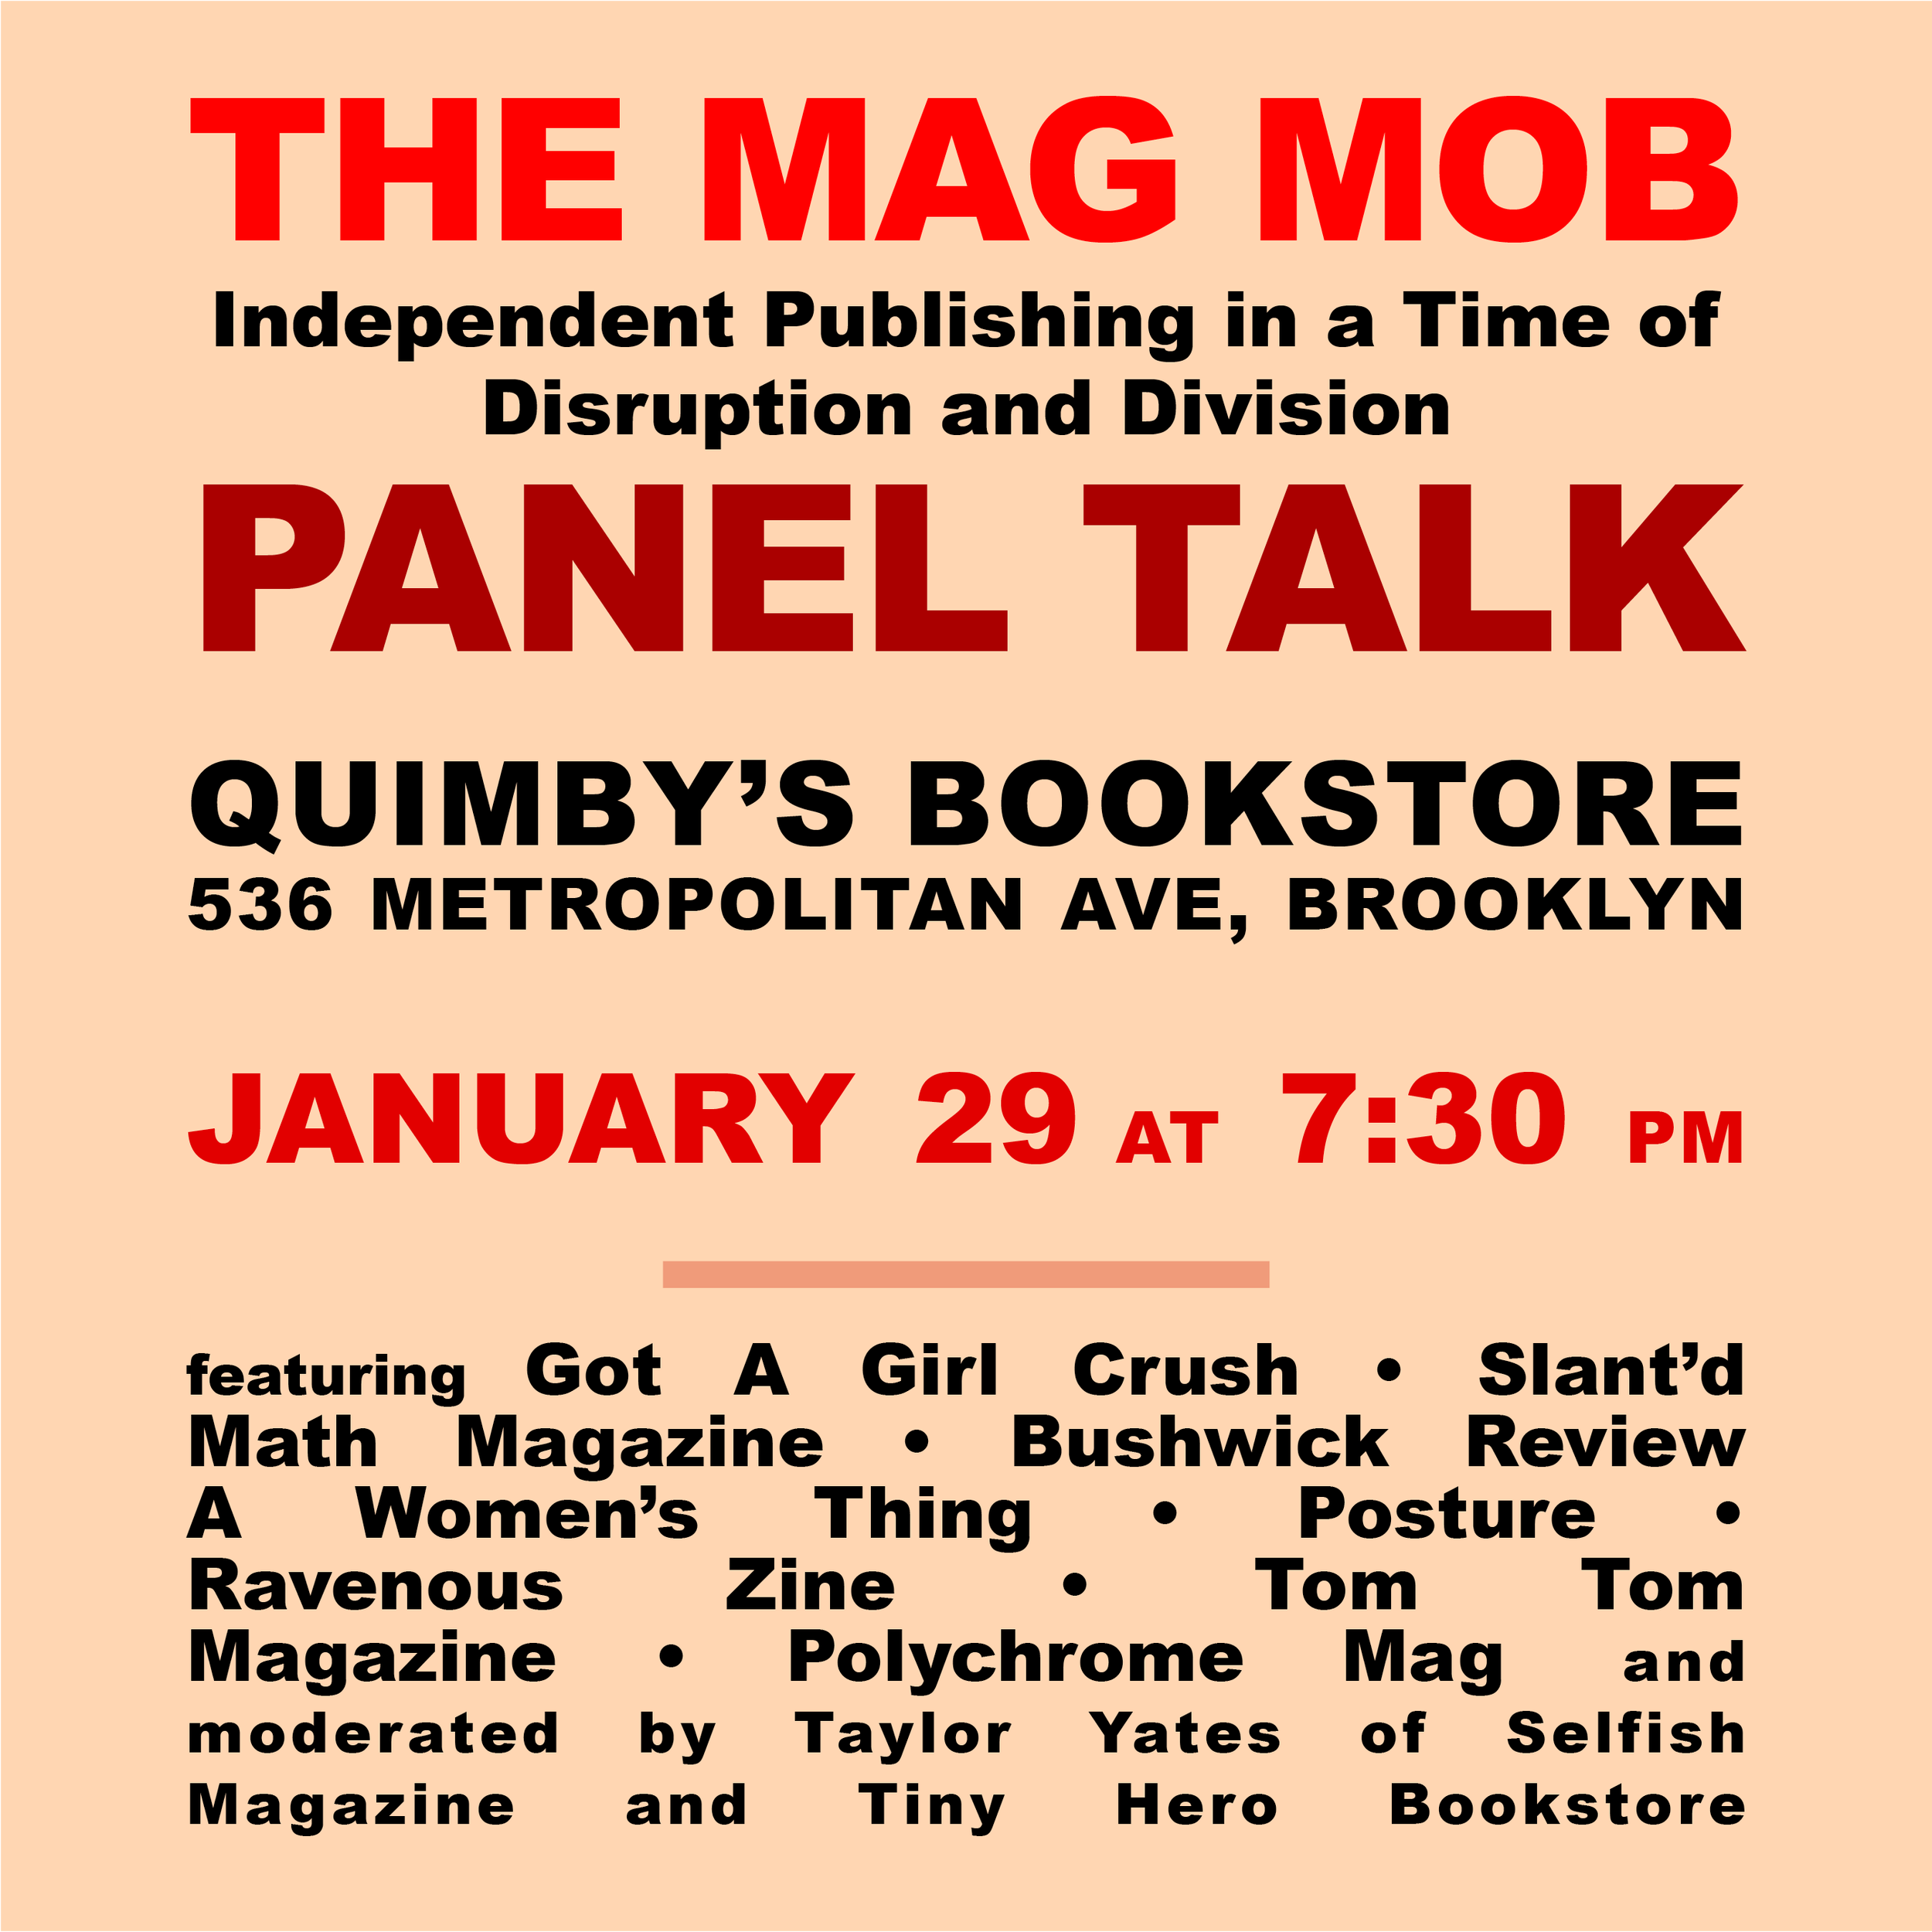 Mag Mob Panel Talk Flyer_3.png